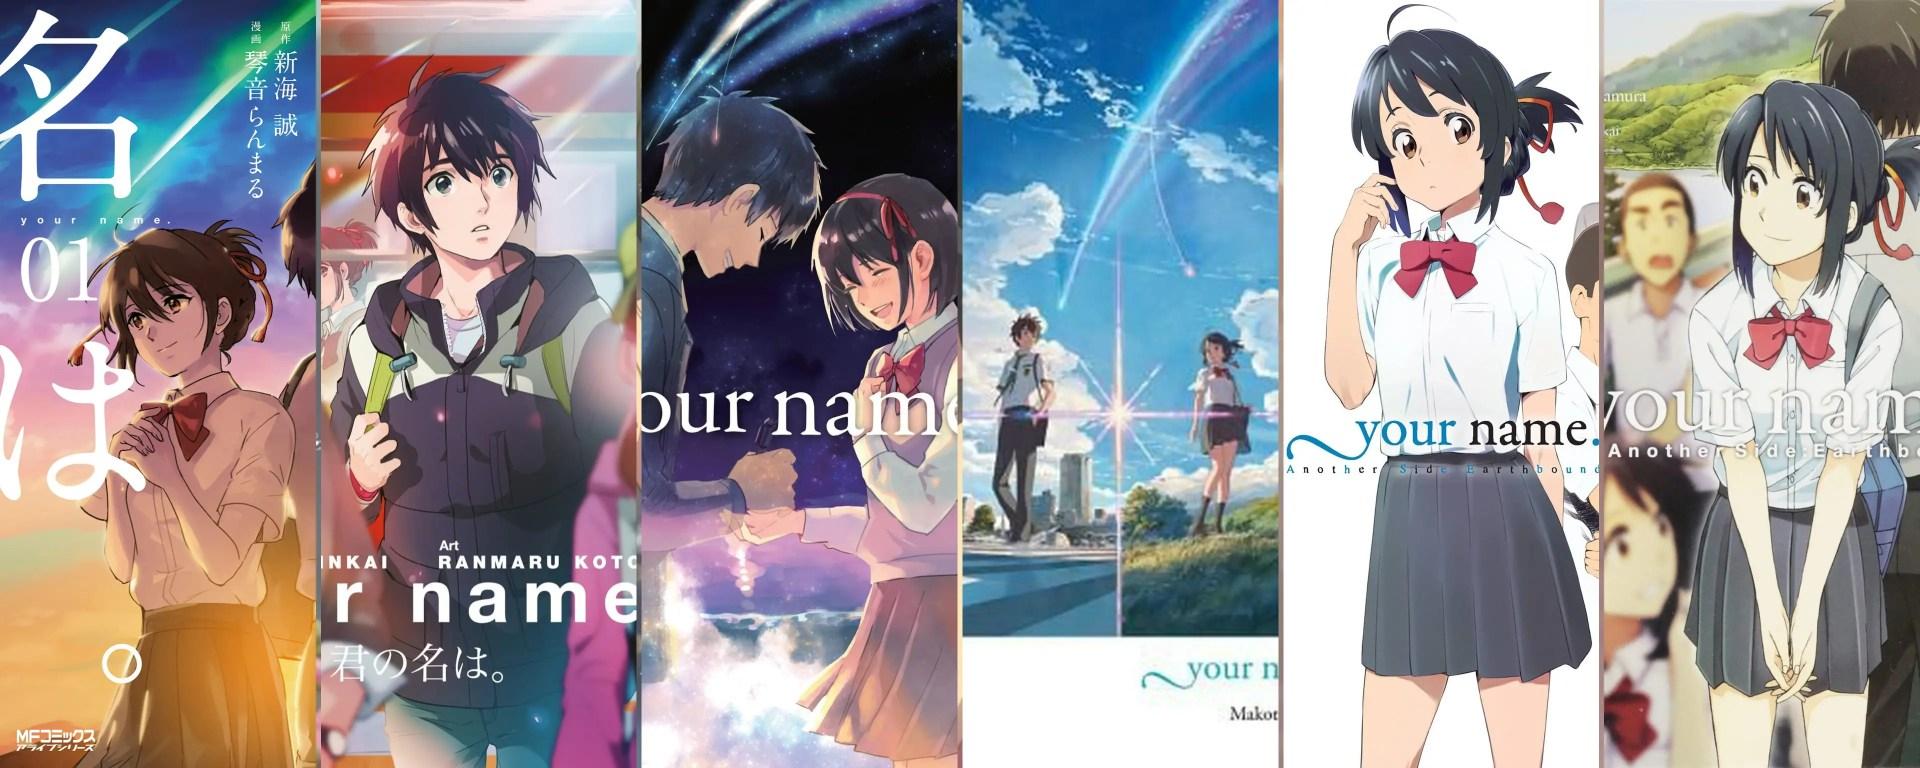 Buy Kimi No Na Wa Books Your Name Books